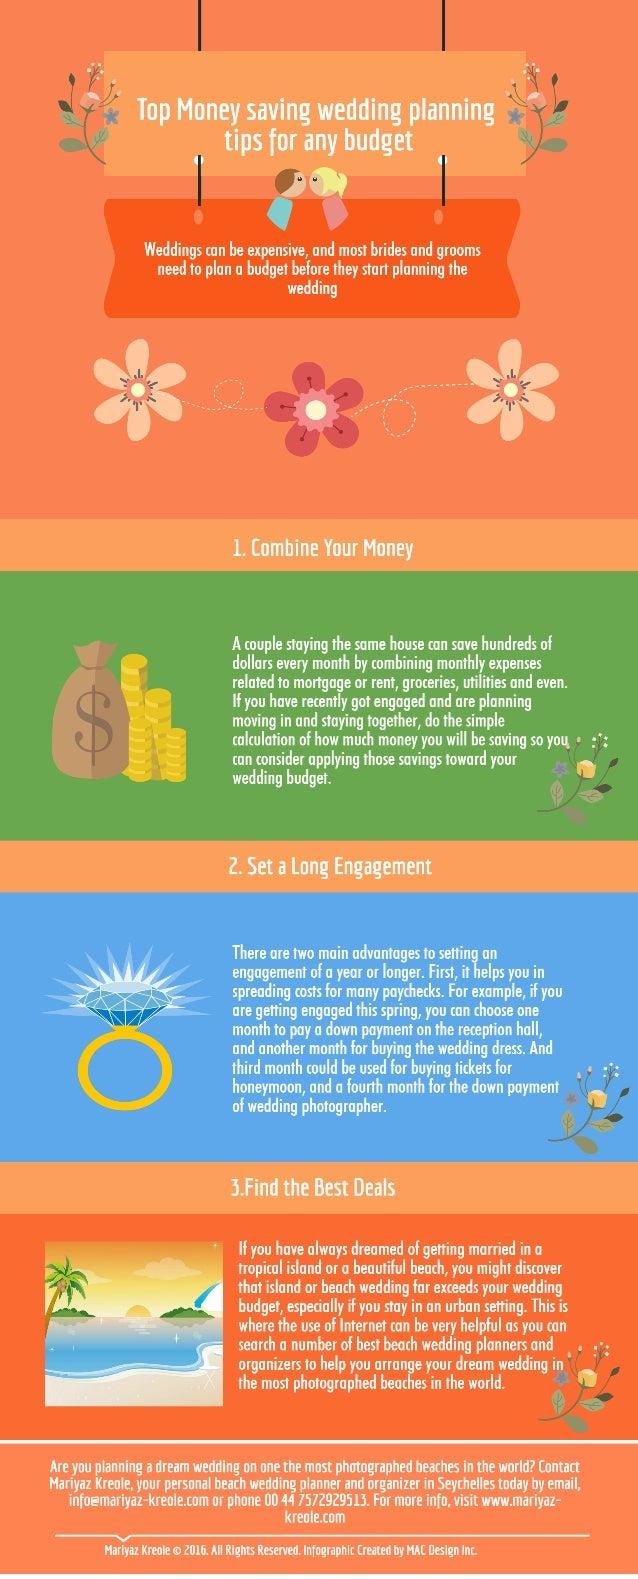 Top money saving wedding planning tips from seychelles wedding planner & organizer